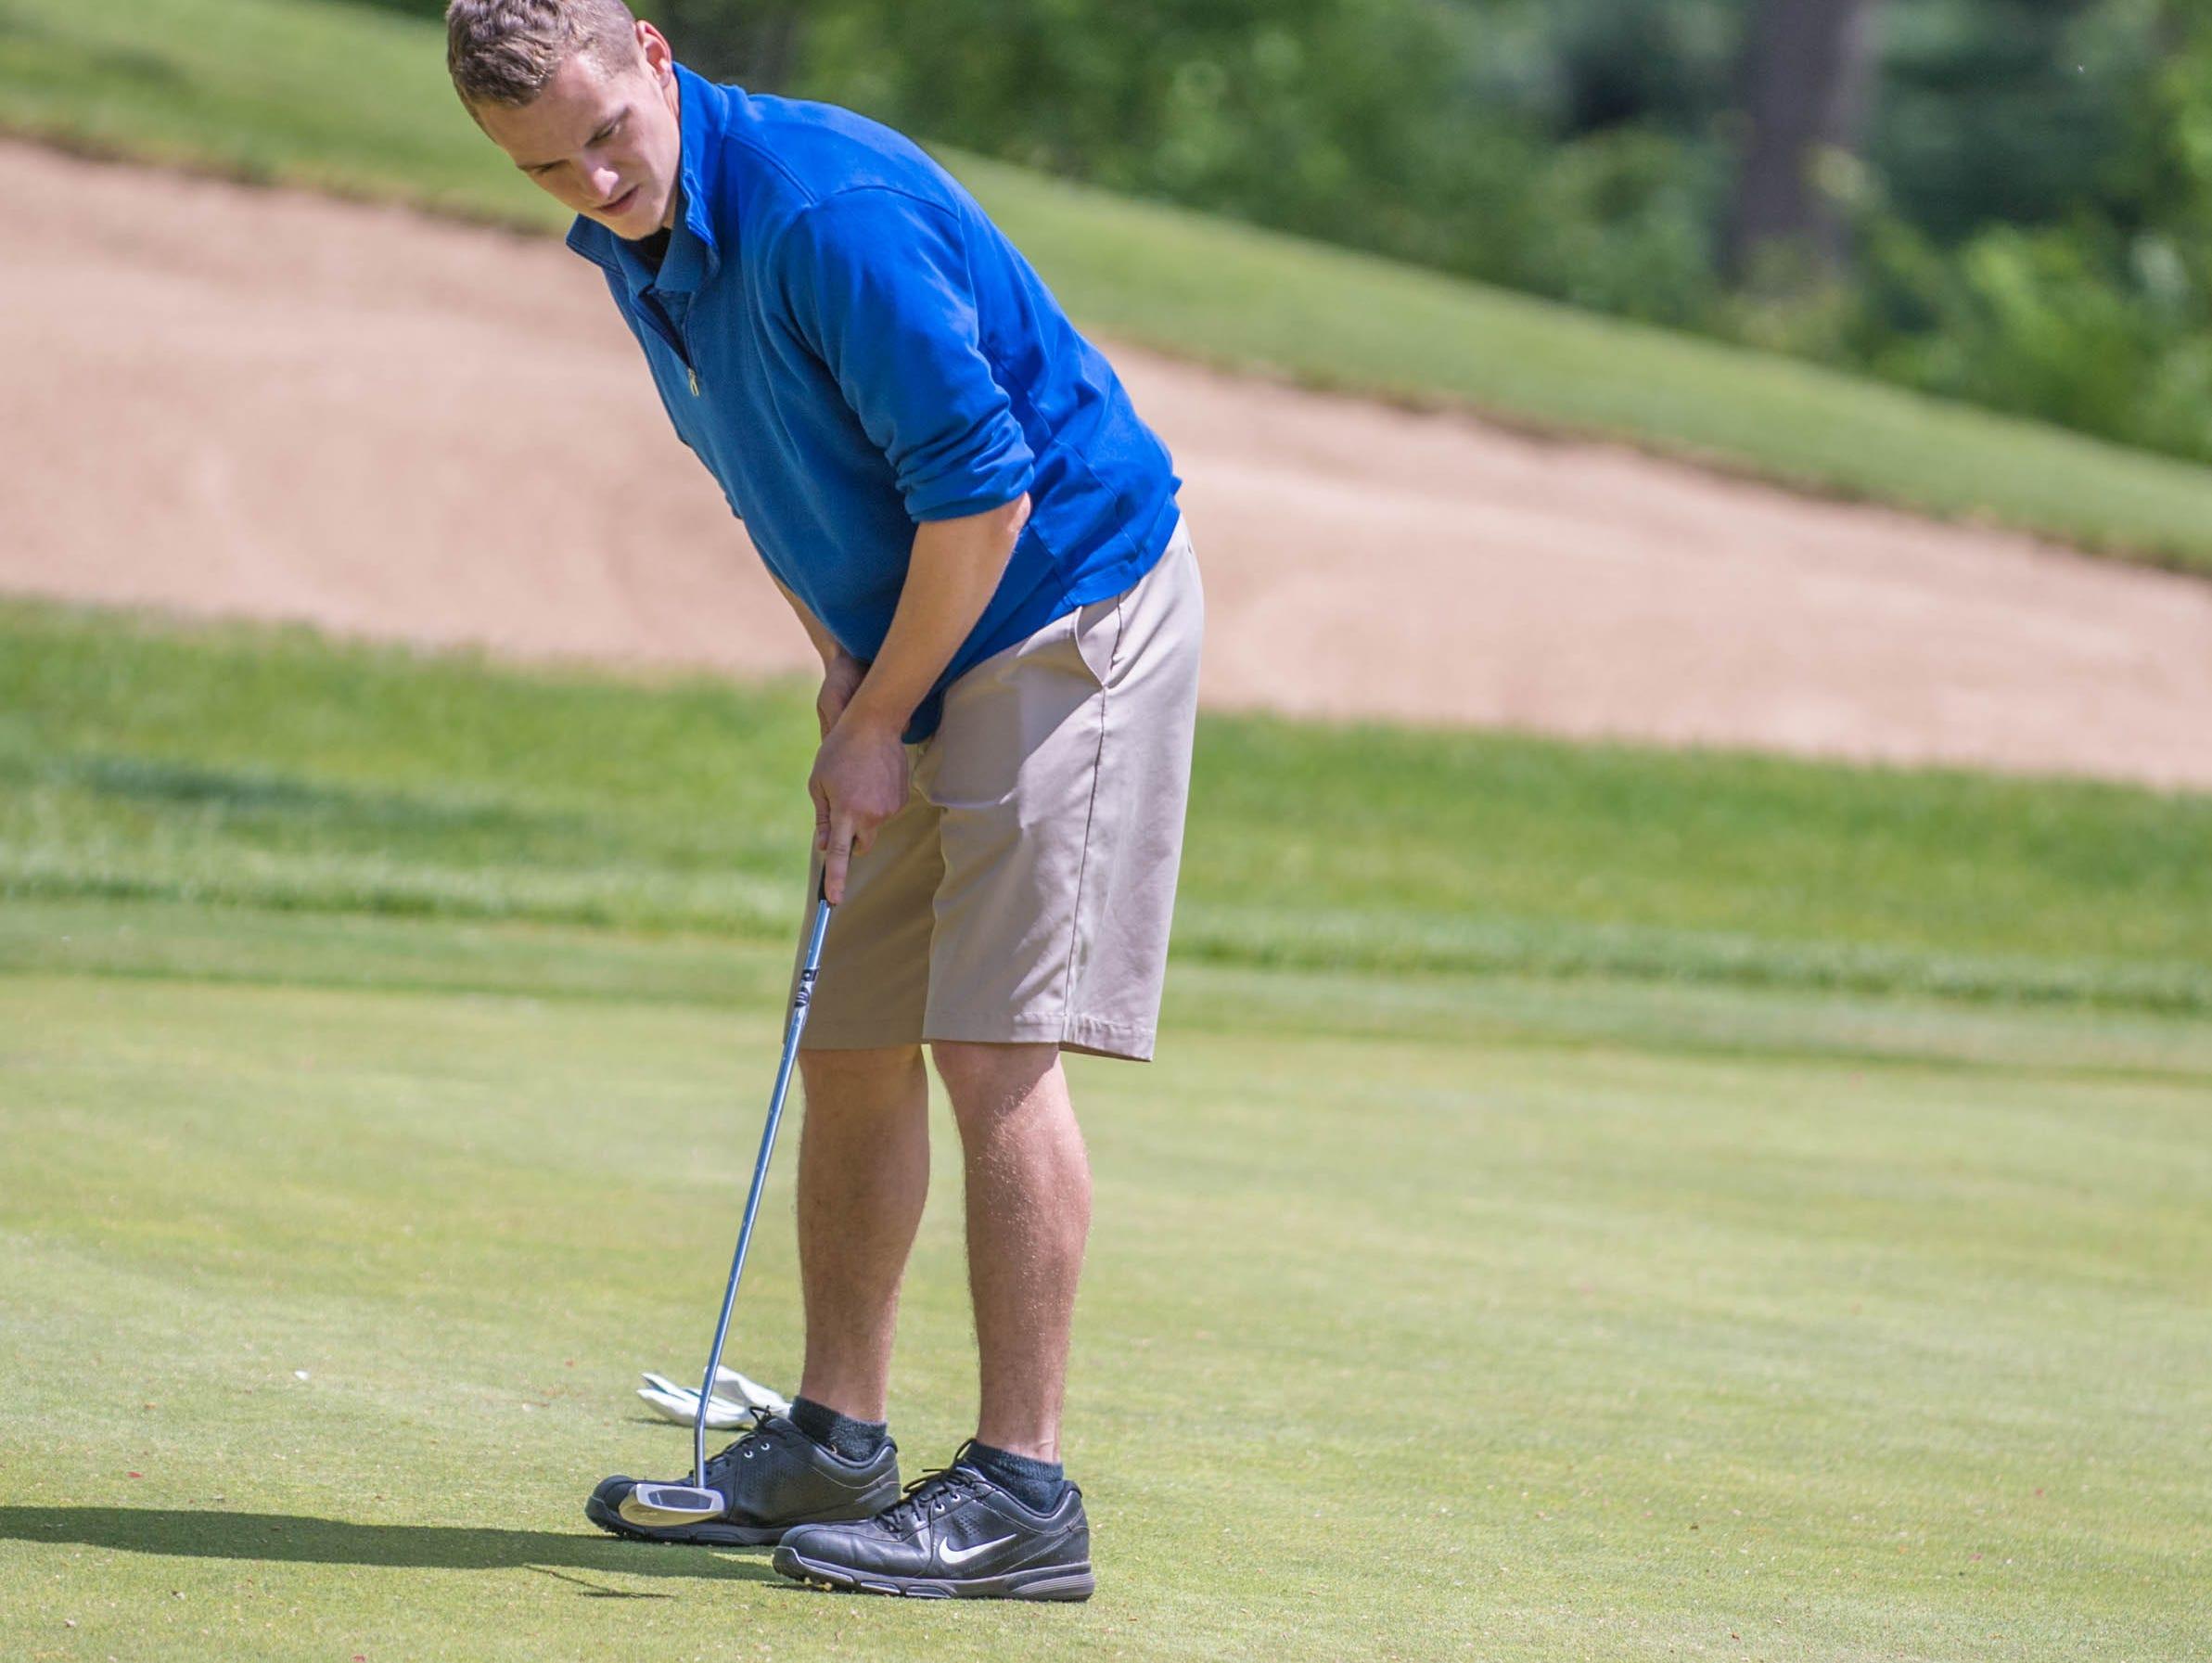 Harper Creek senior Zachary Wilson hits his putt during All City High School Golf at Riverside Golf Club on Friday.